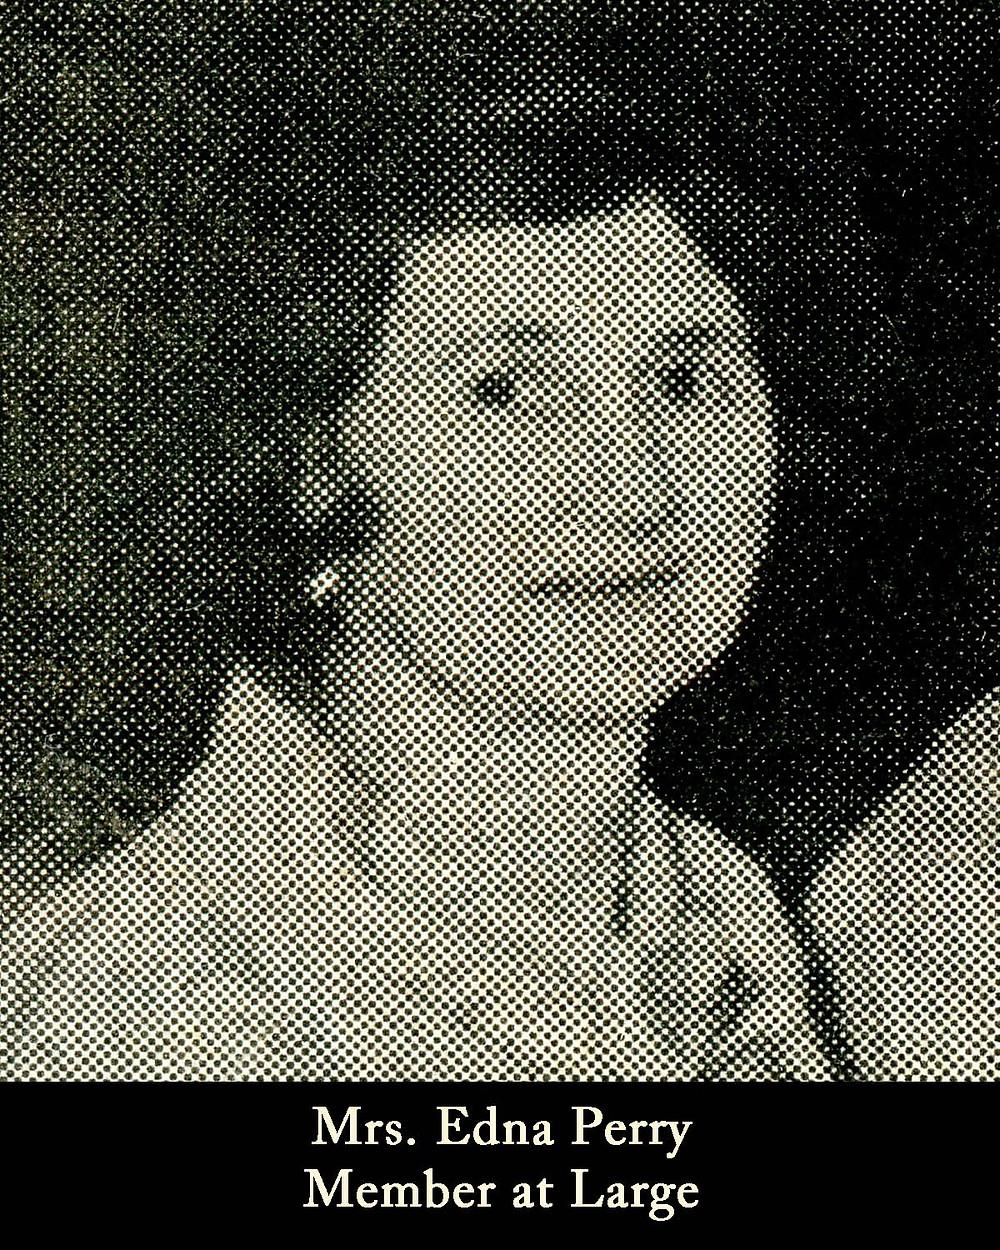 Edna Perry